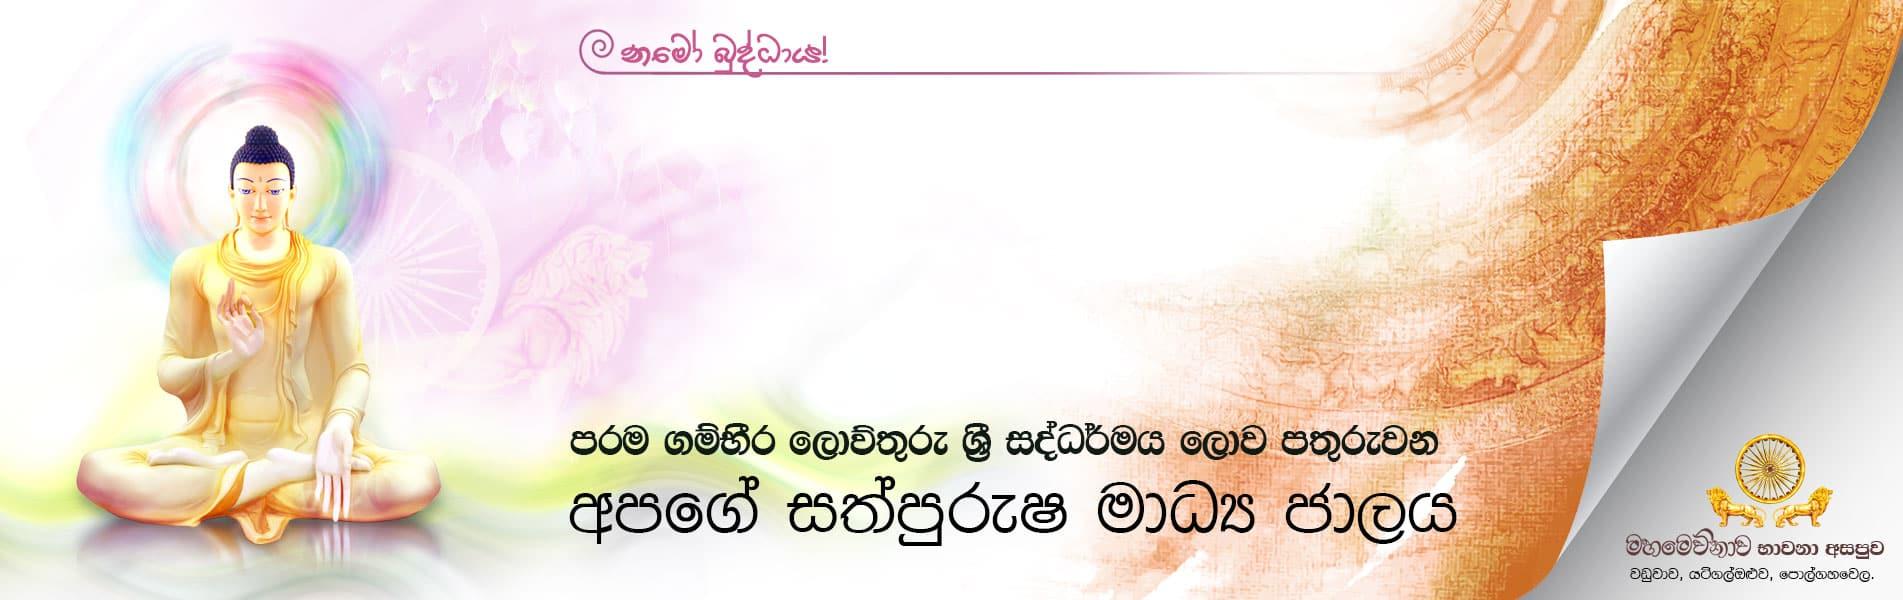 Mahamevnawa Media